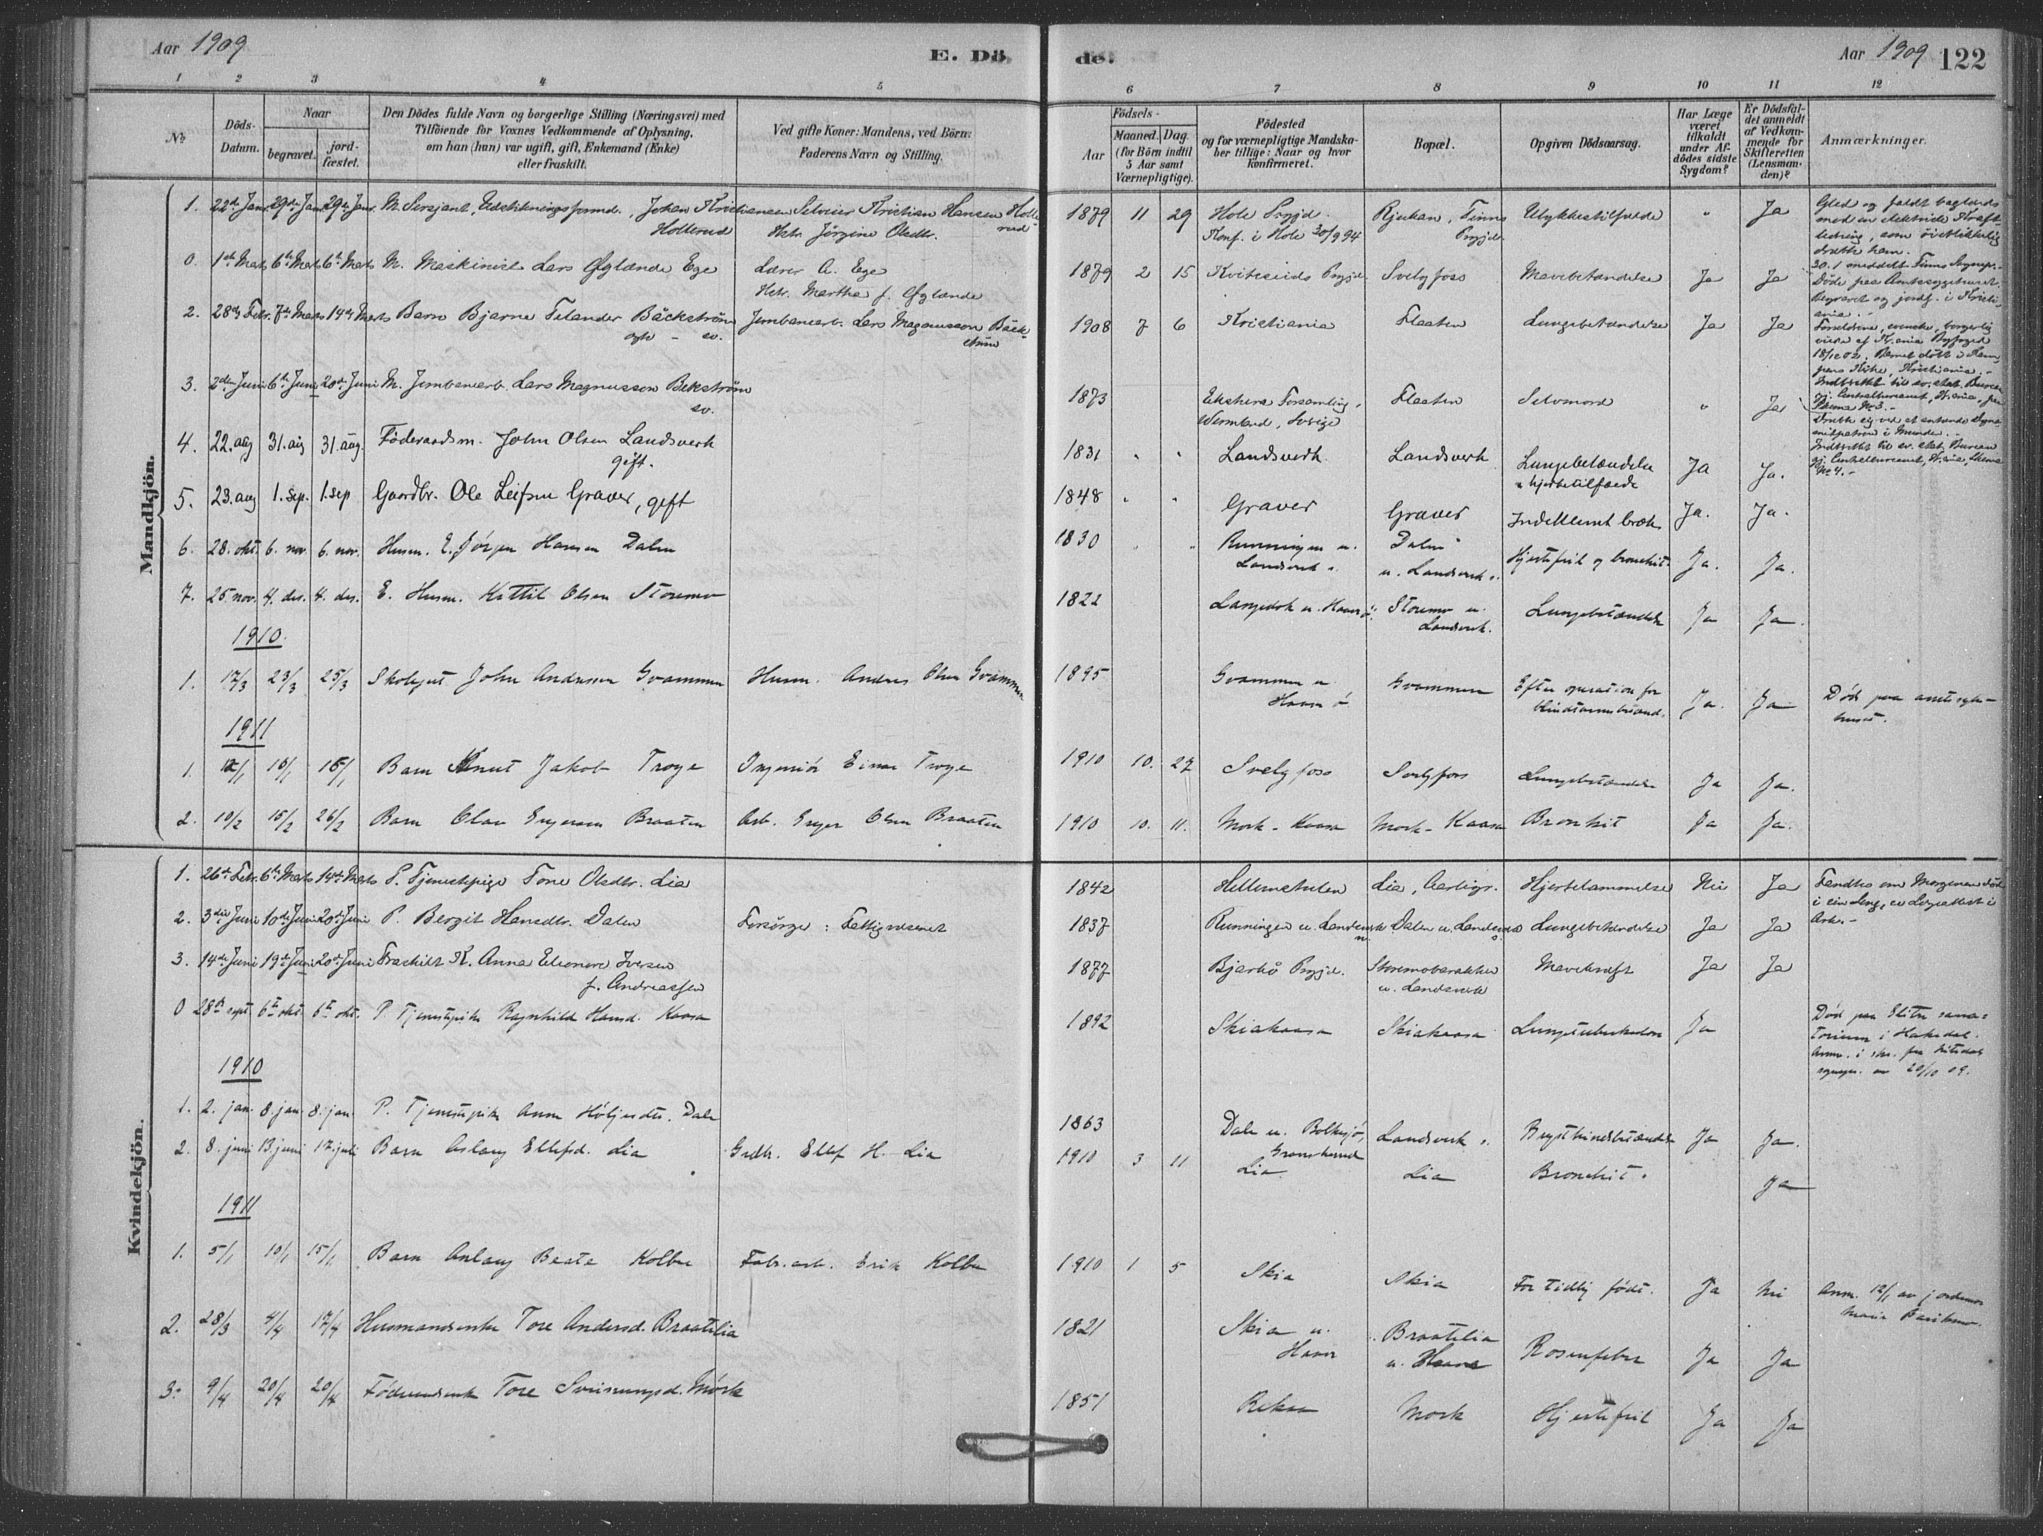 SAKO, Heddal kirkebøker, F/Fb/L0002: Ministerialbok nr. II 2, 1878-1913, s. 122